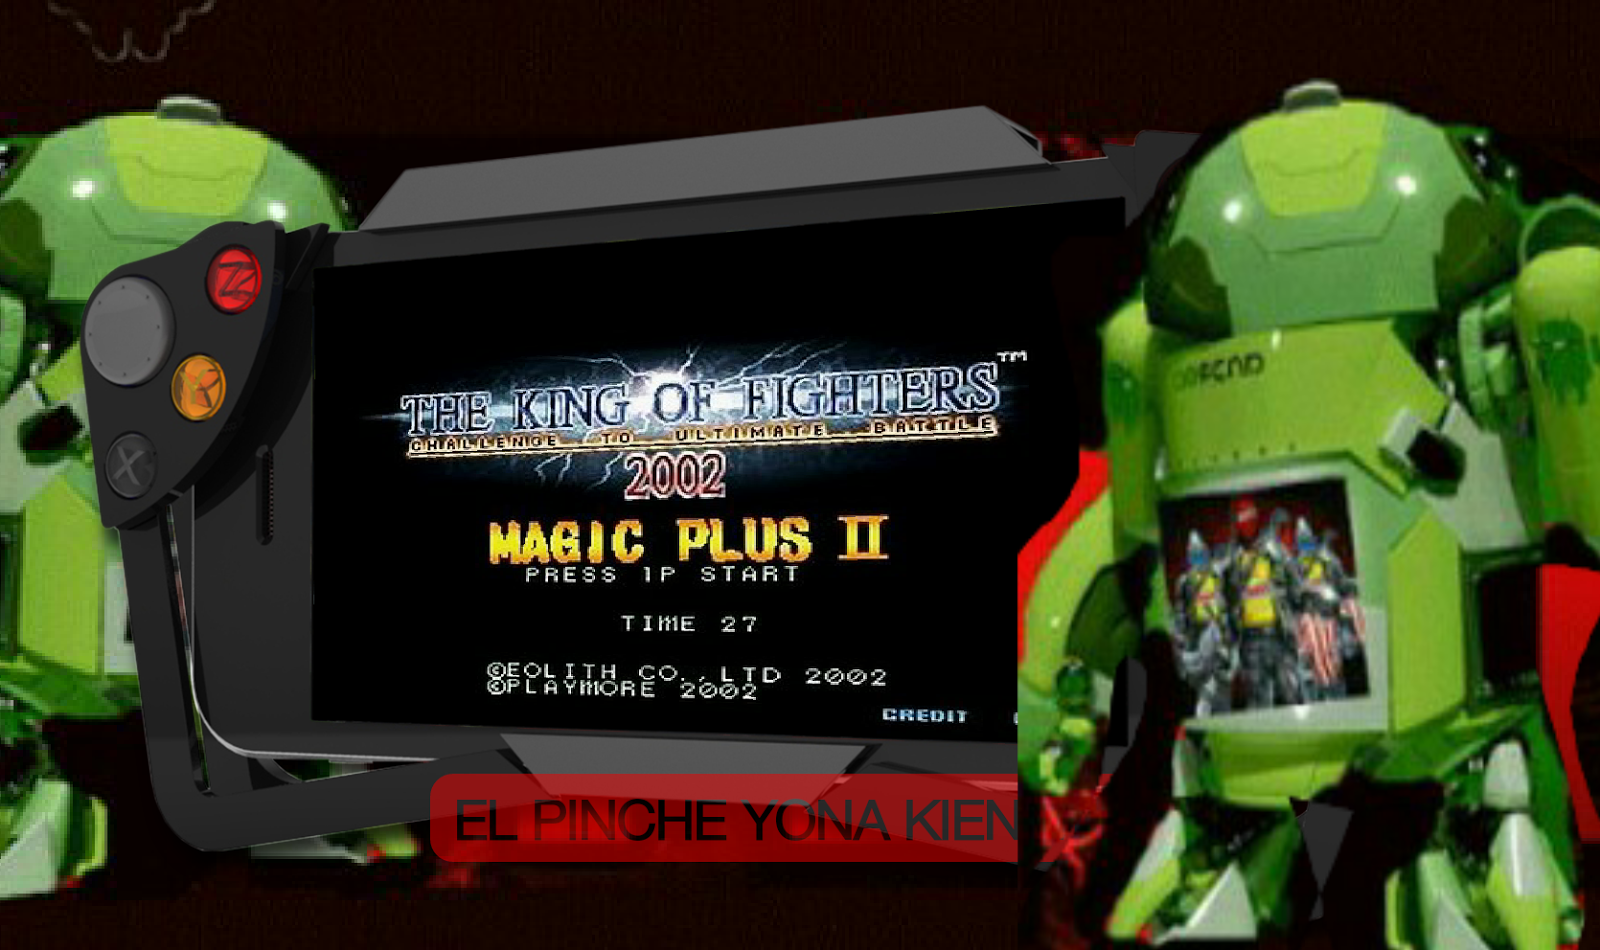 kof 2002 magic plus 2 apk sin emulador para android